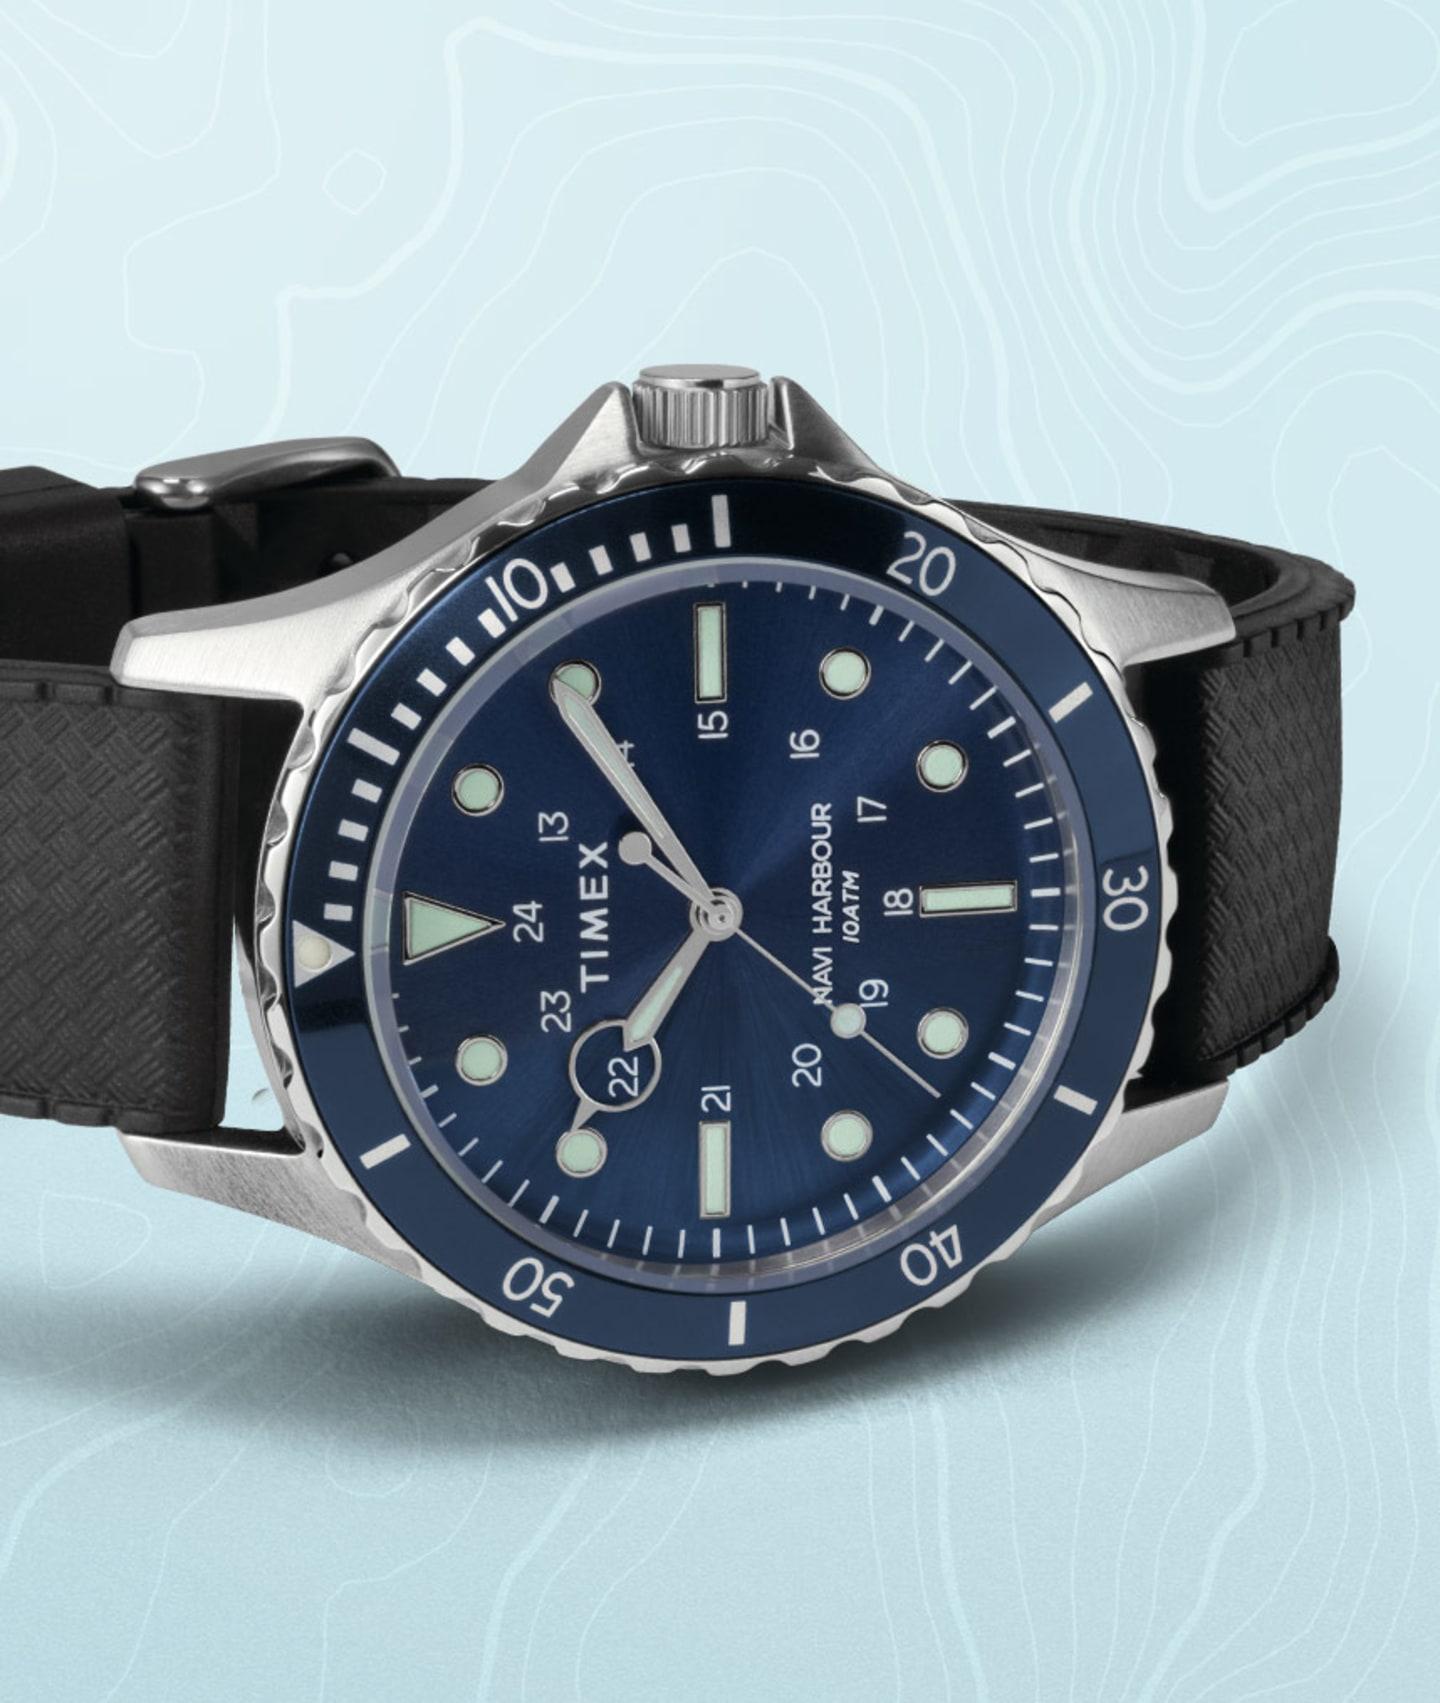 Zegarek Marlin Automatic.